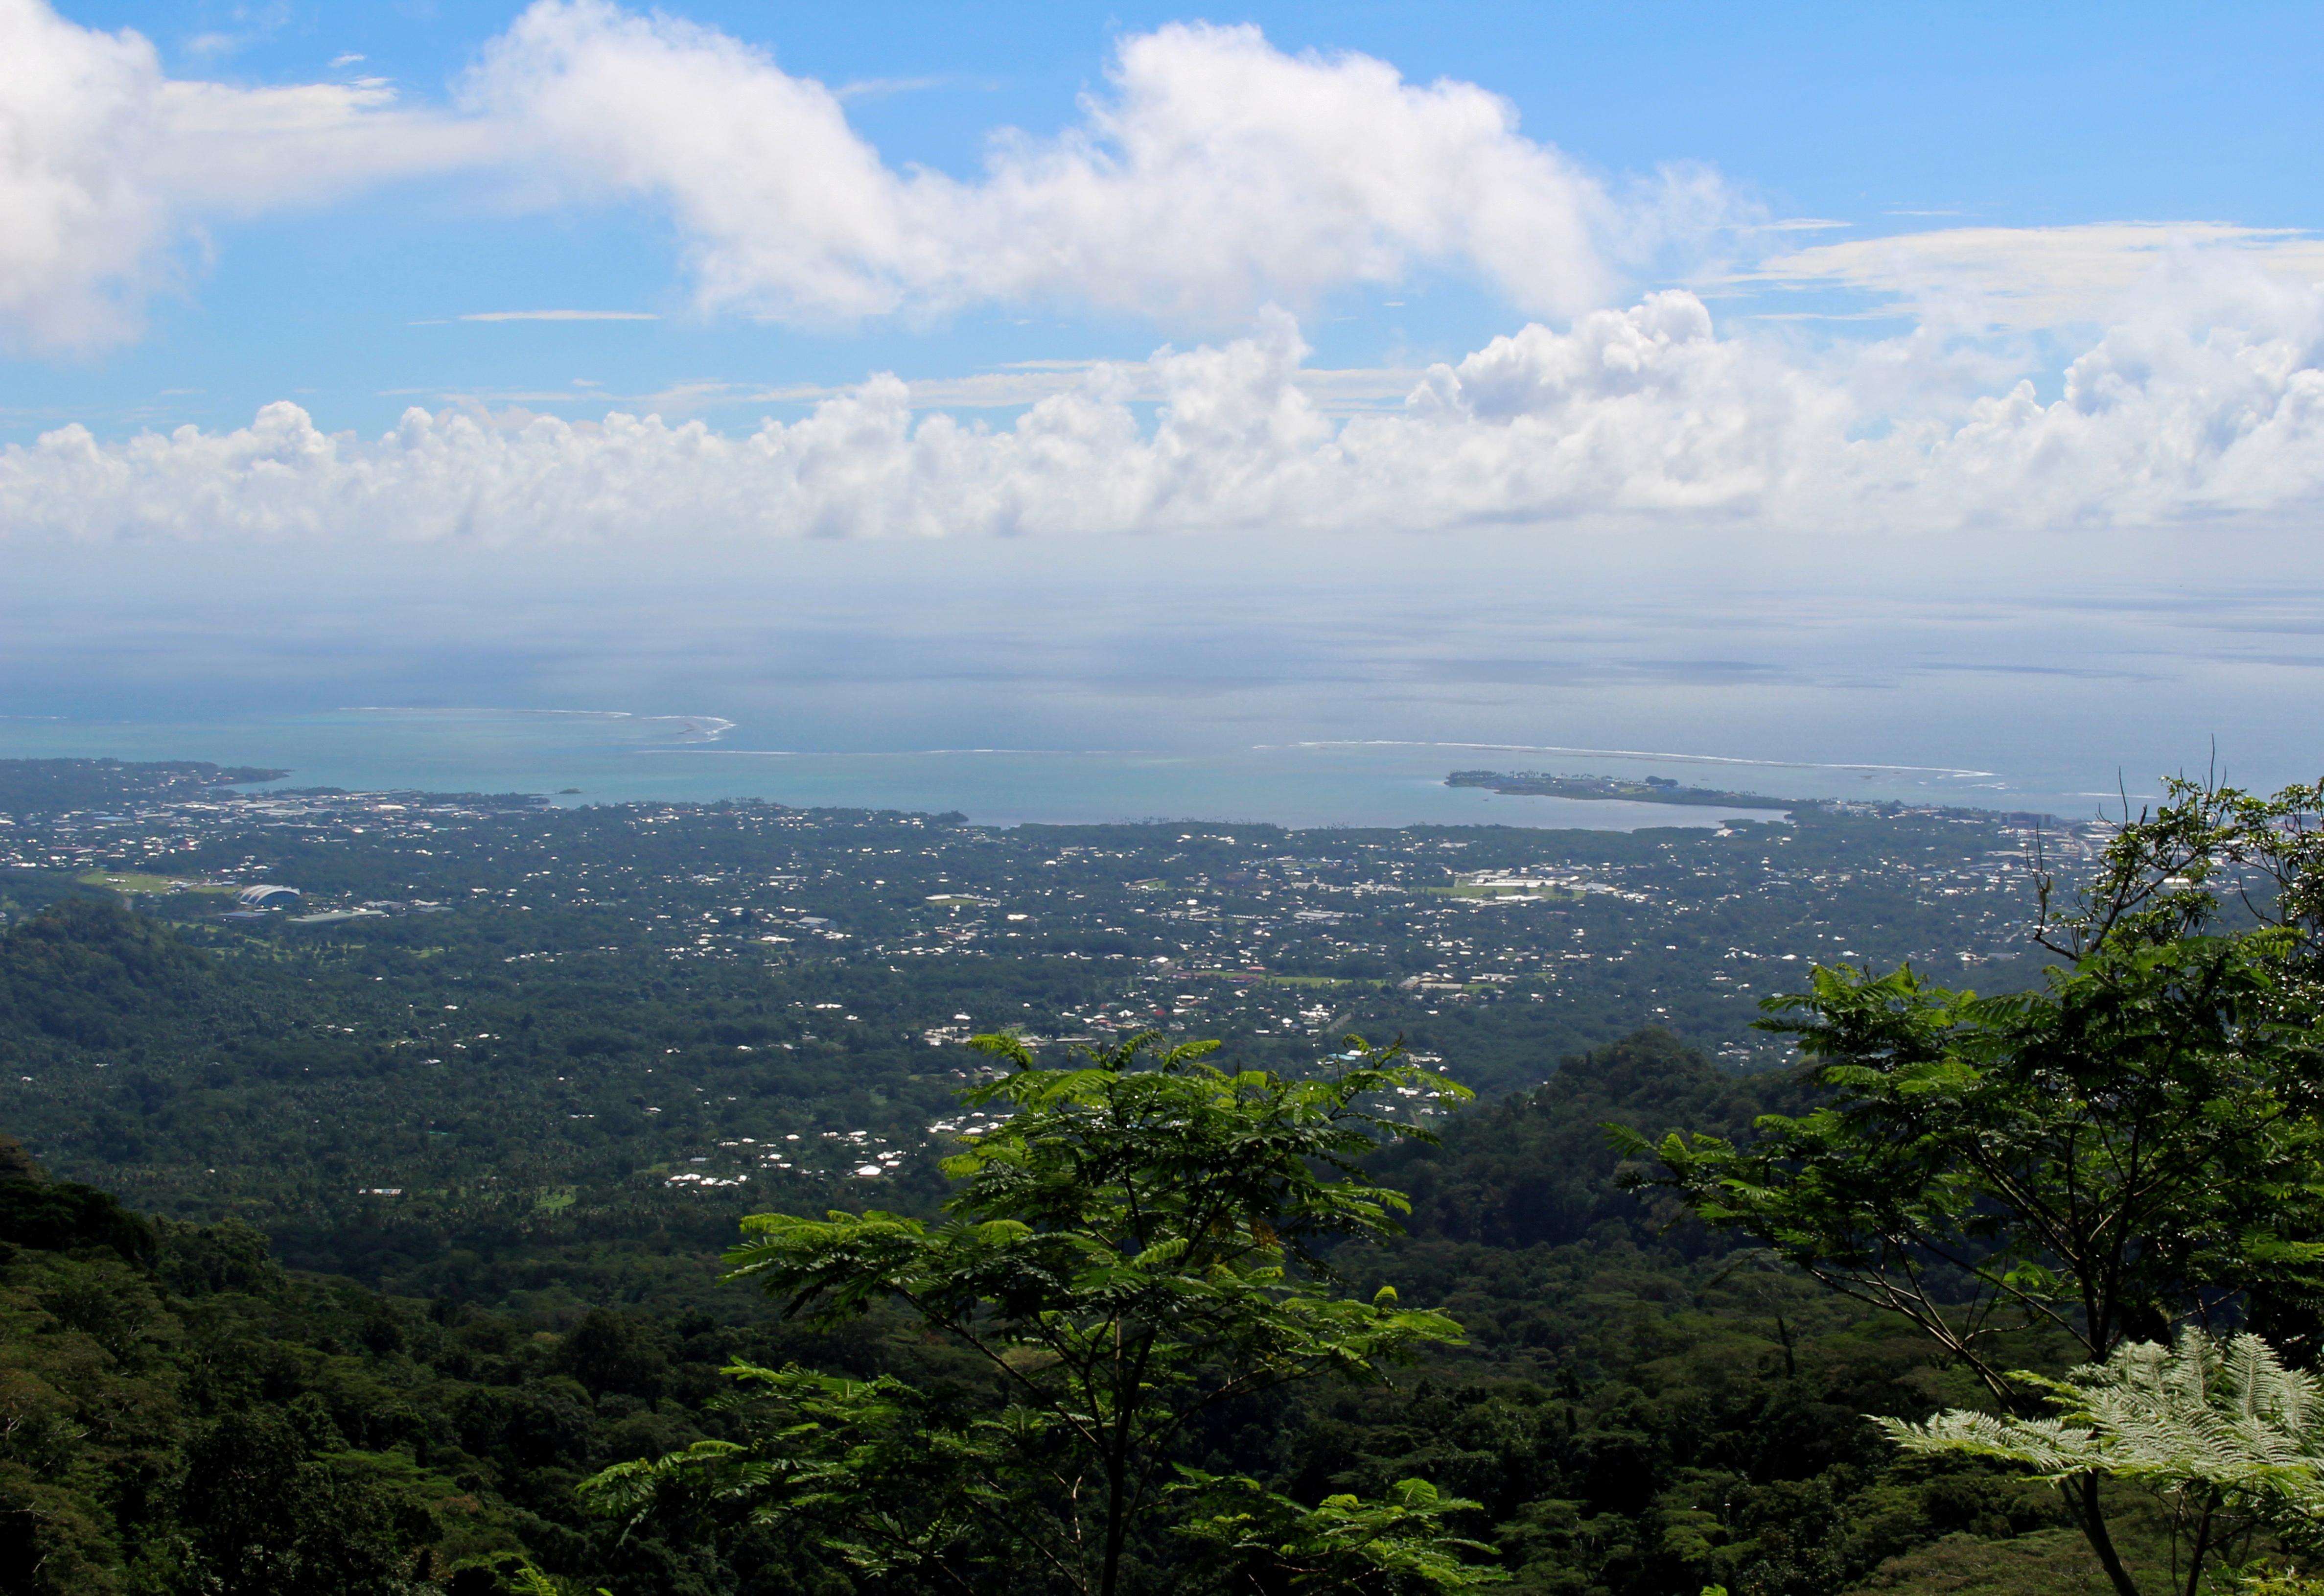 A view of the capital Apia, Samoa, July 12, 2019. REUTERS/Jonathan Barrett